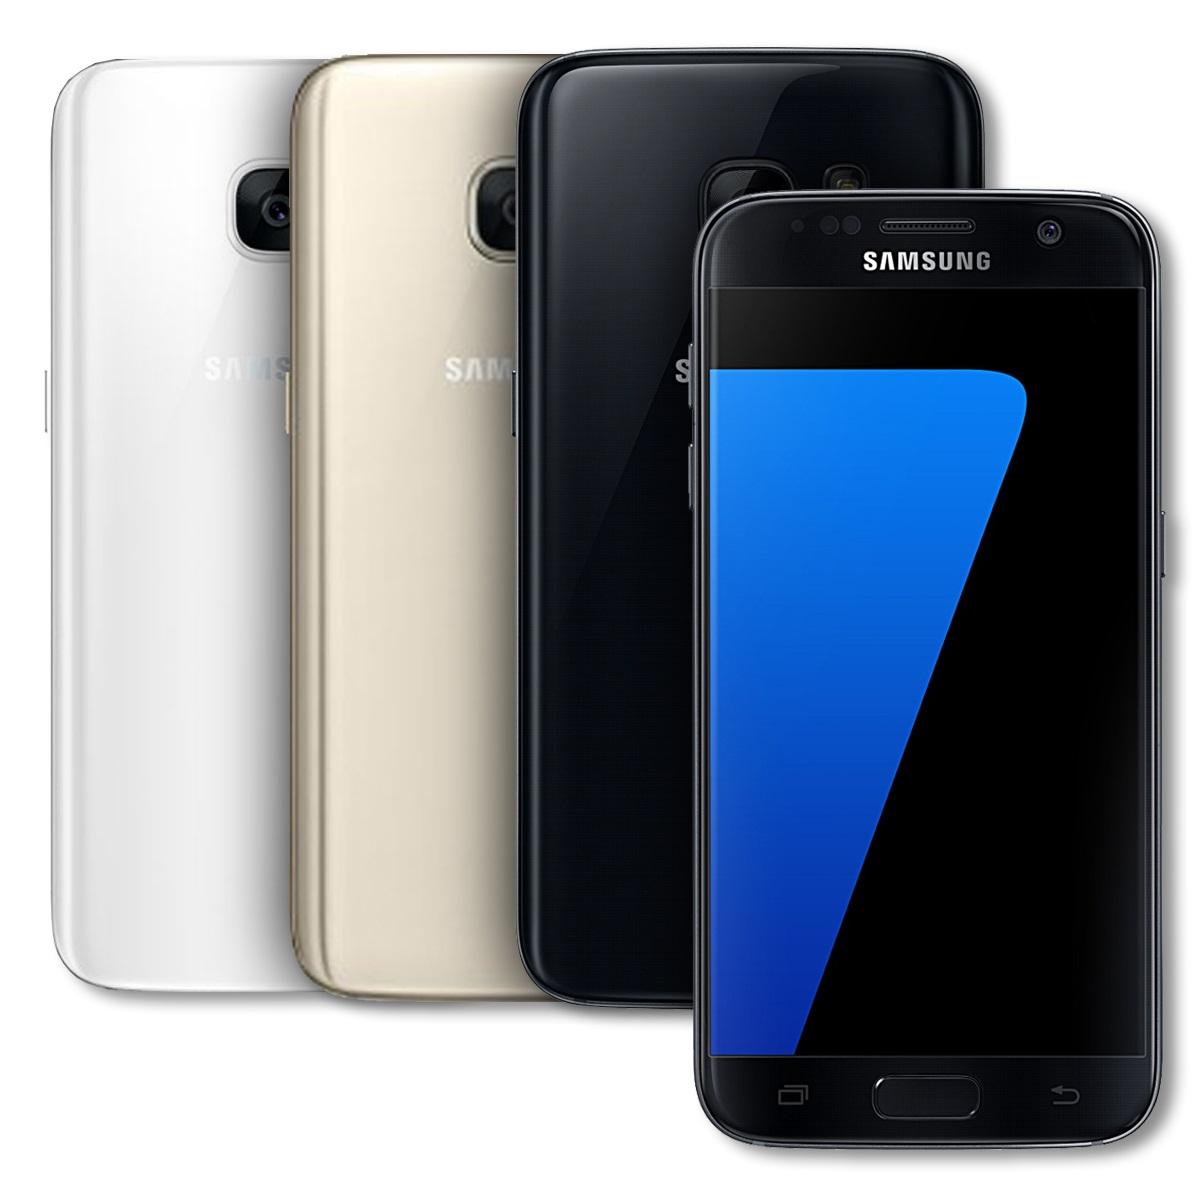 samsung galaxy s7 smartphone g930 unlocked 4g lte 32gb. Black Bedroom Furniture Sets. Home Design Ideas